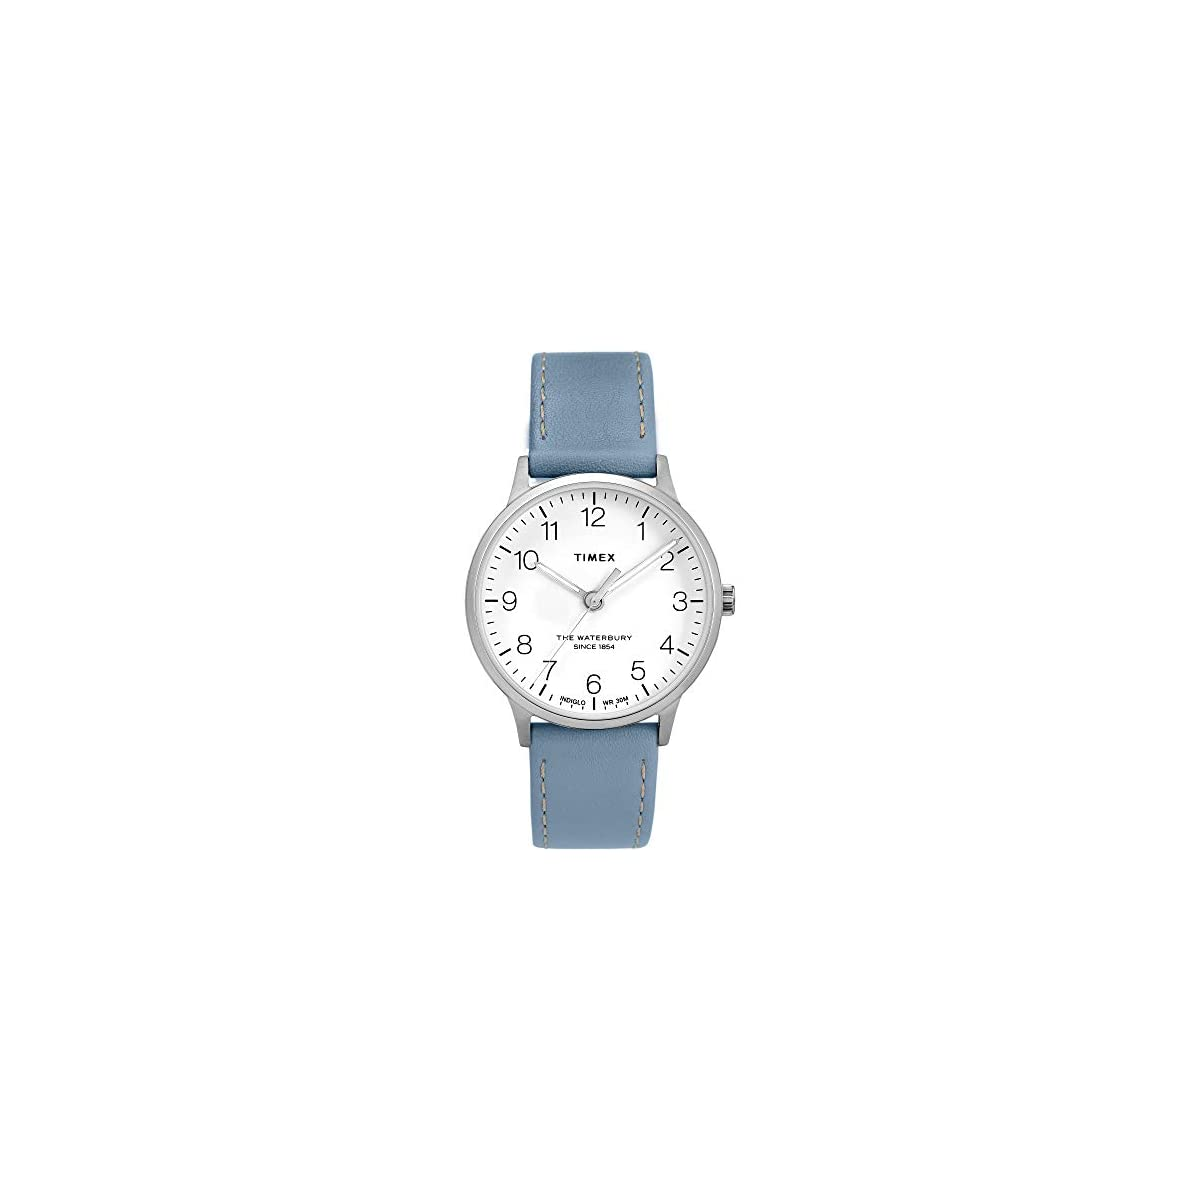 41g7Ua%2BrWcL. SS1200  - Reloj - Timex - para - TW2T27200